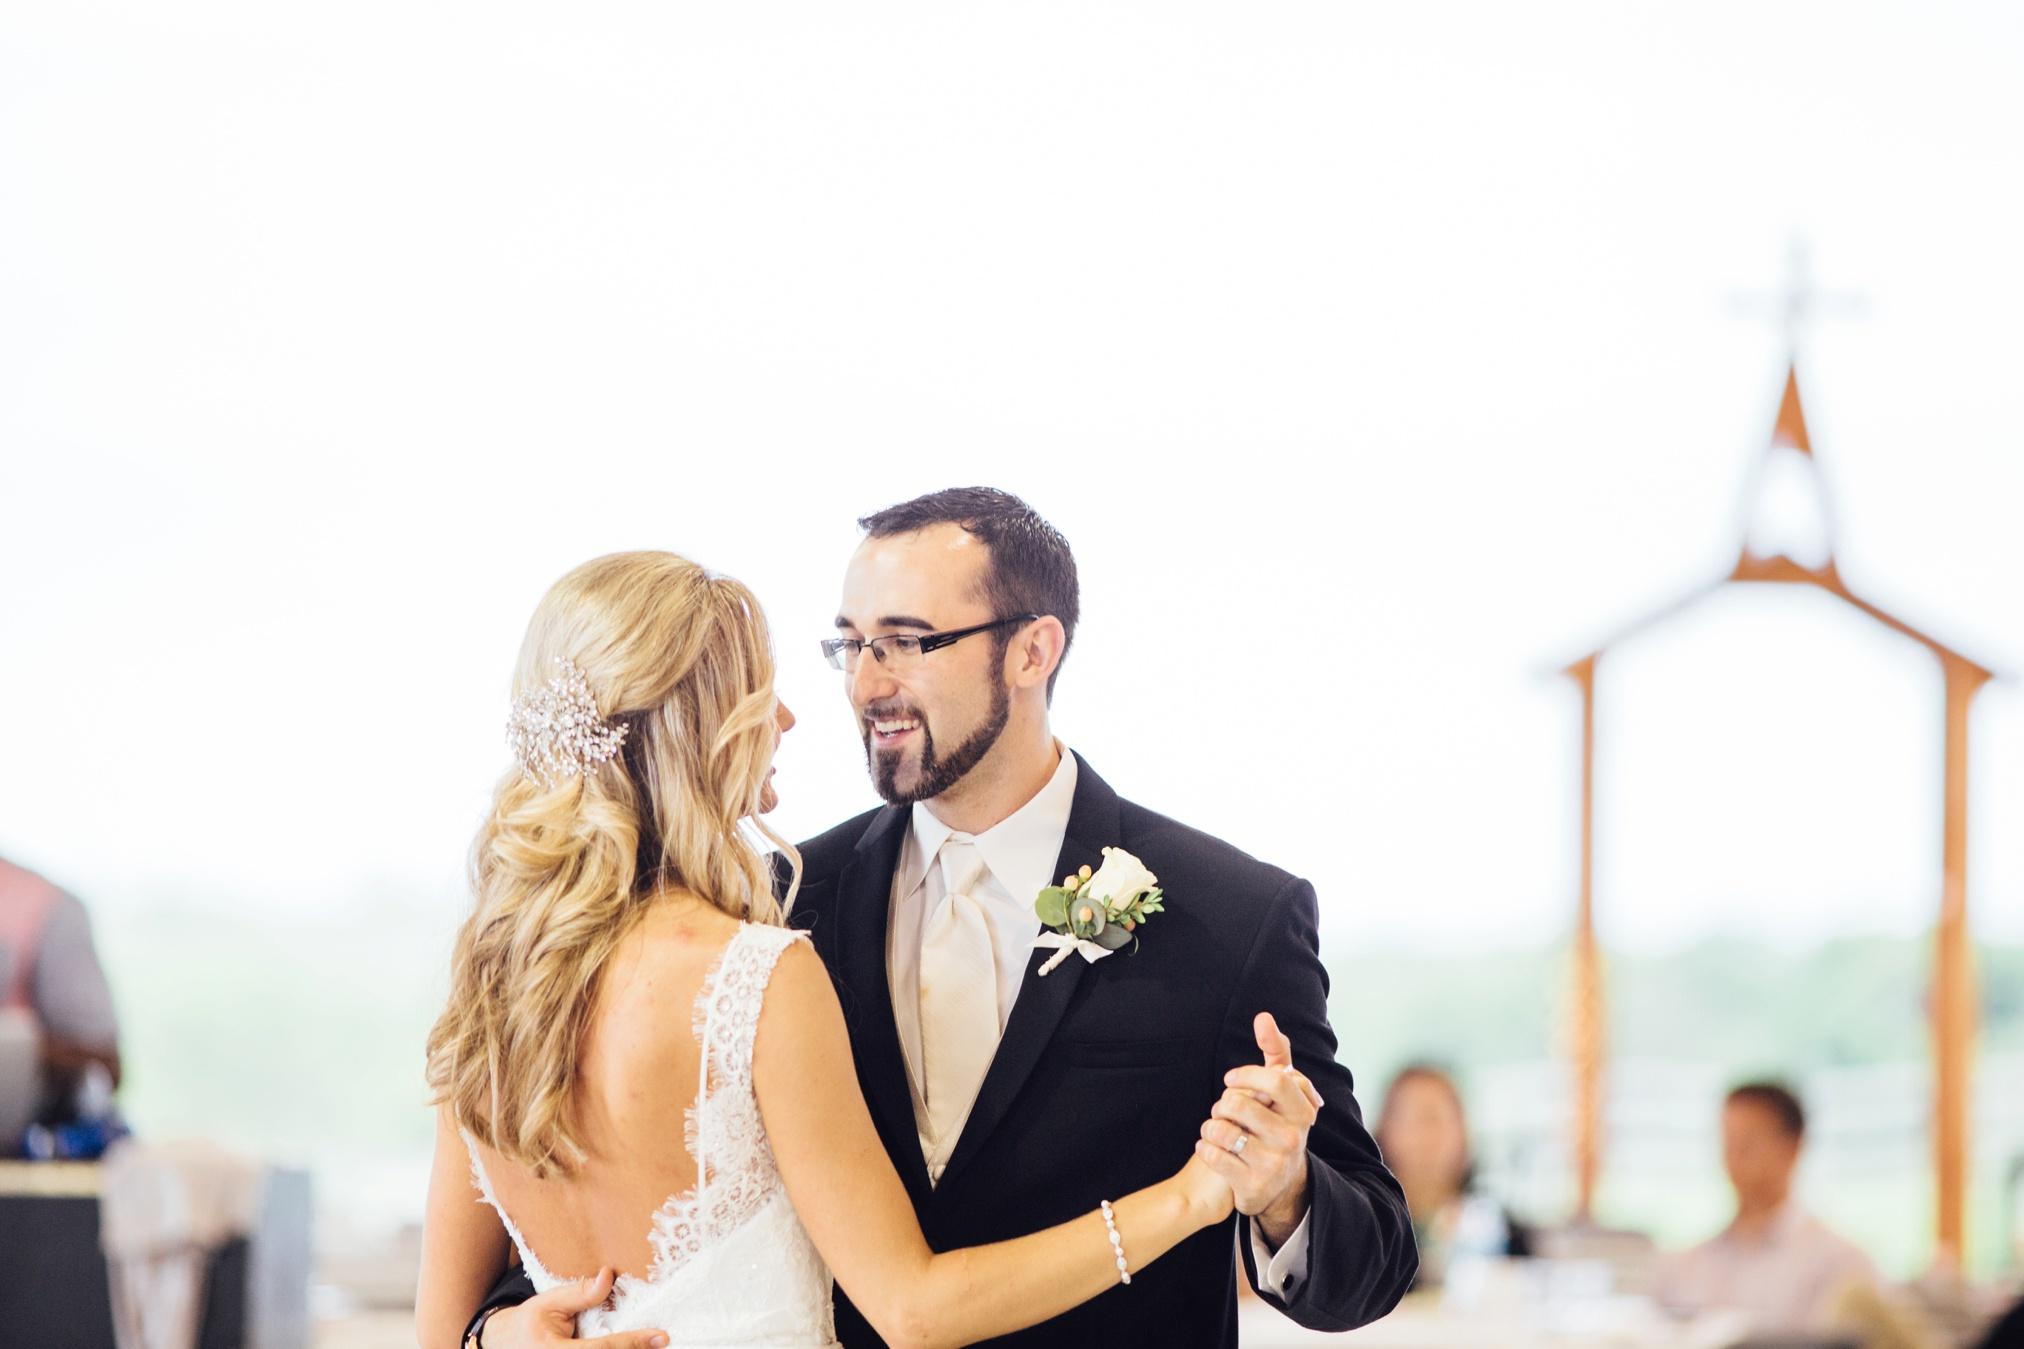 schmid_wedding-763.jpg